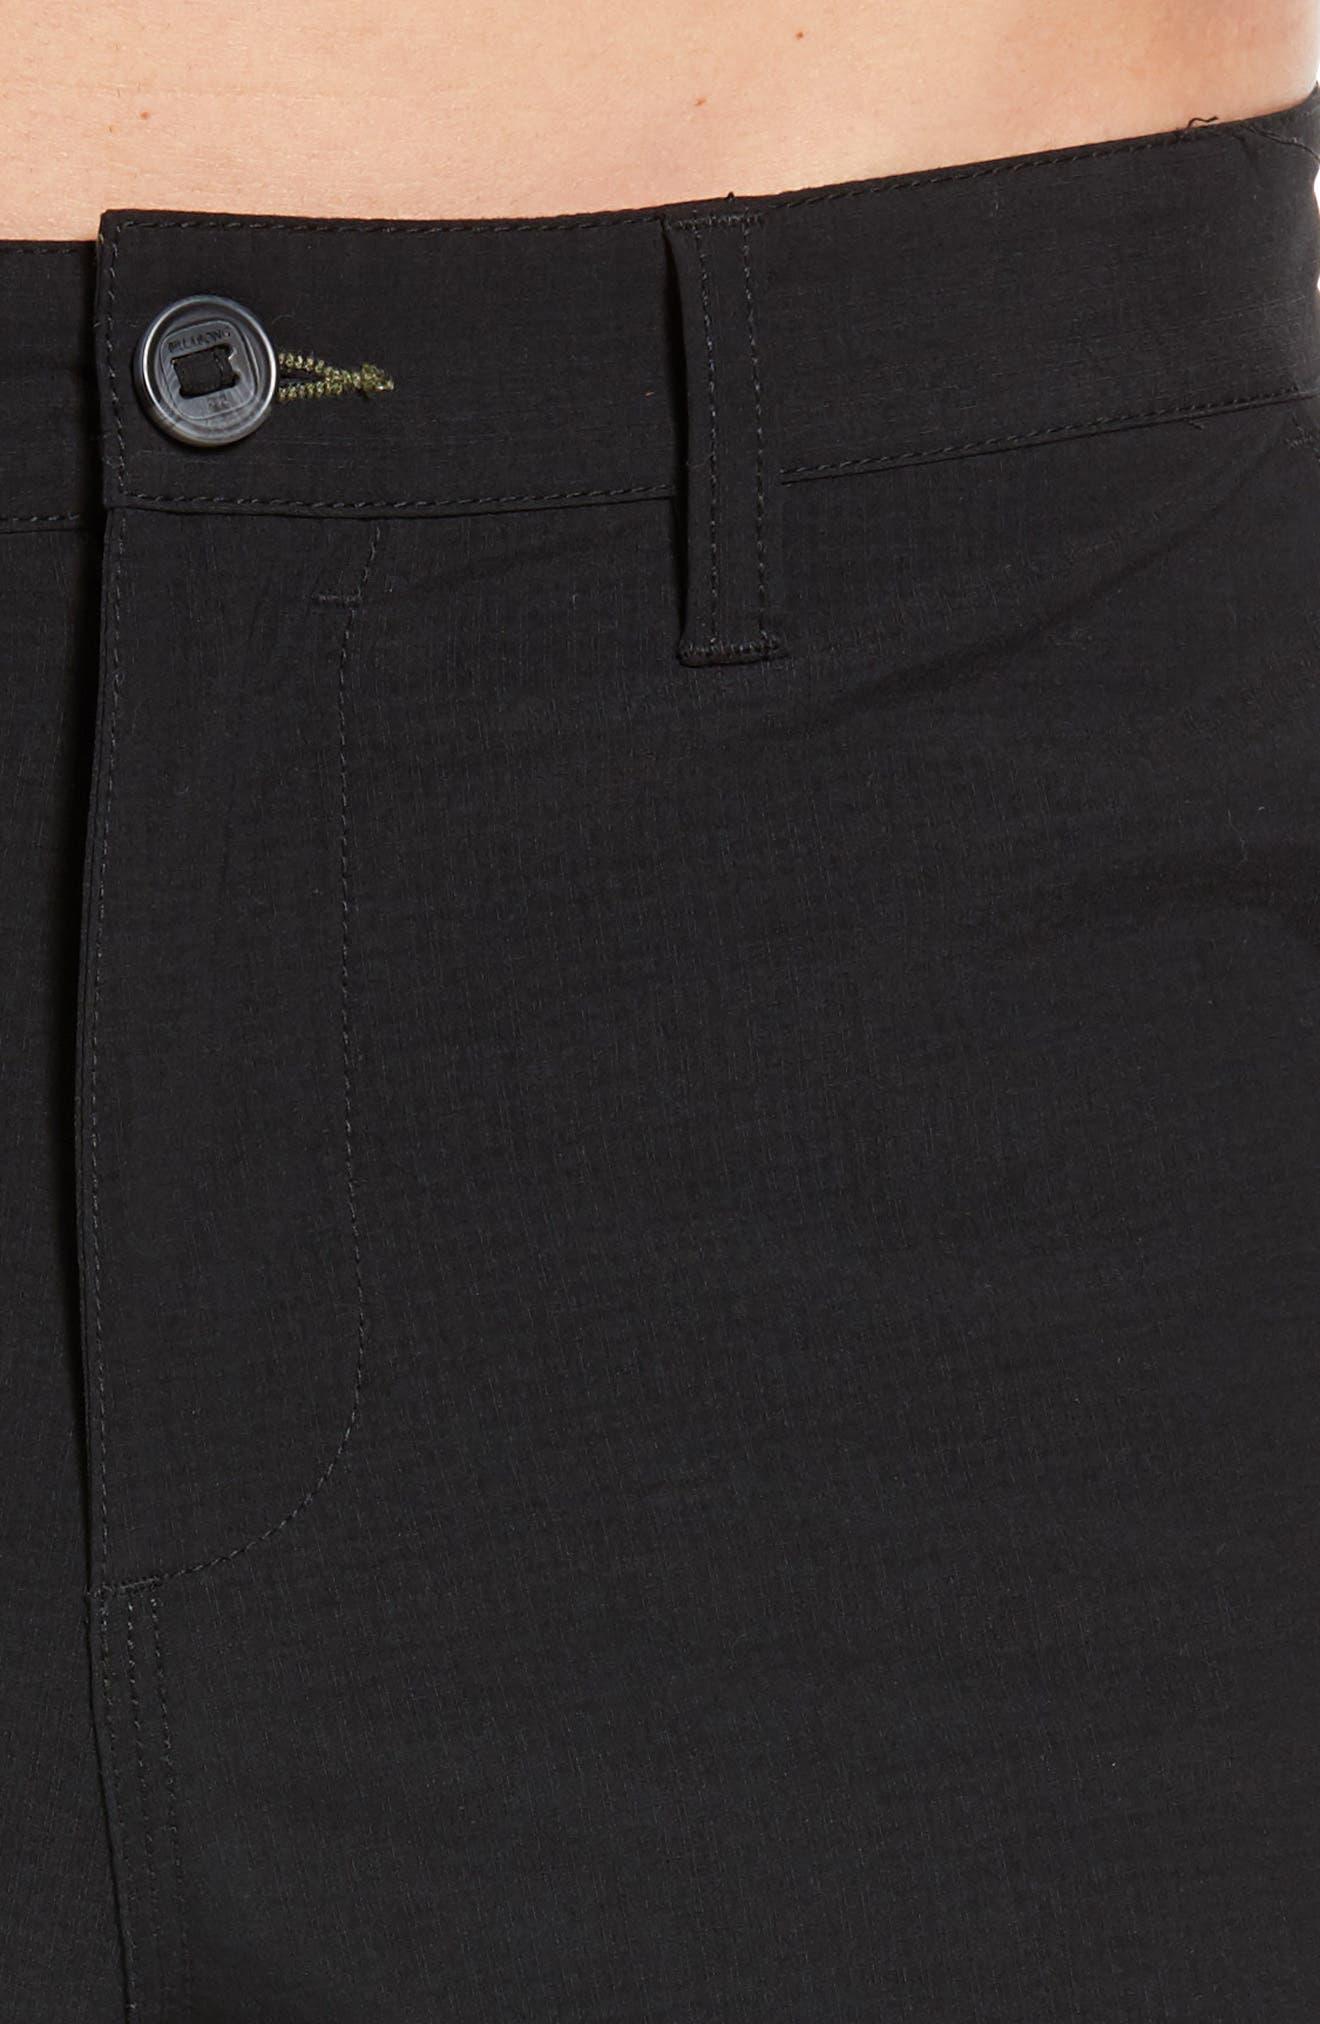 Surfreak Hybrid Shorts,                             Alternate thumbnail 4, color,                             BLACK